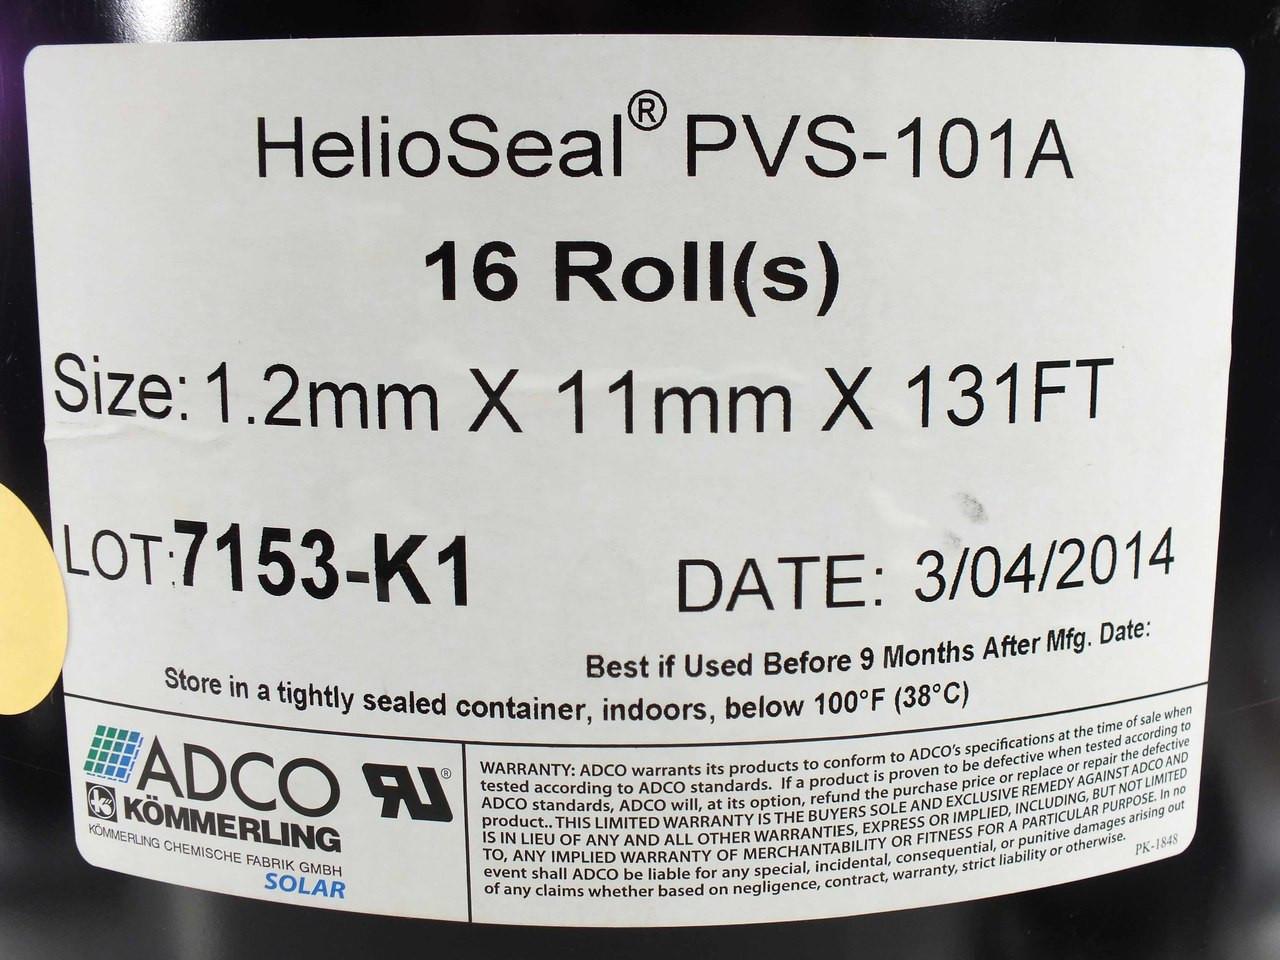 Royal PVS-101 HelioSeal Solar Panel Bonding Sealant 55mm x 10.5mm x 68m